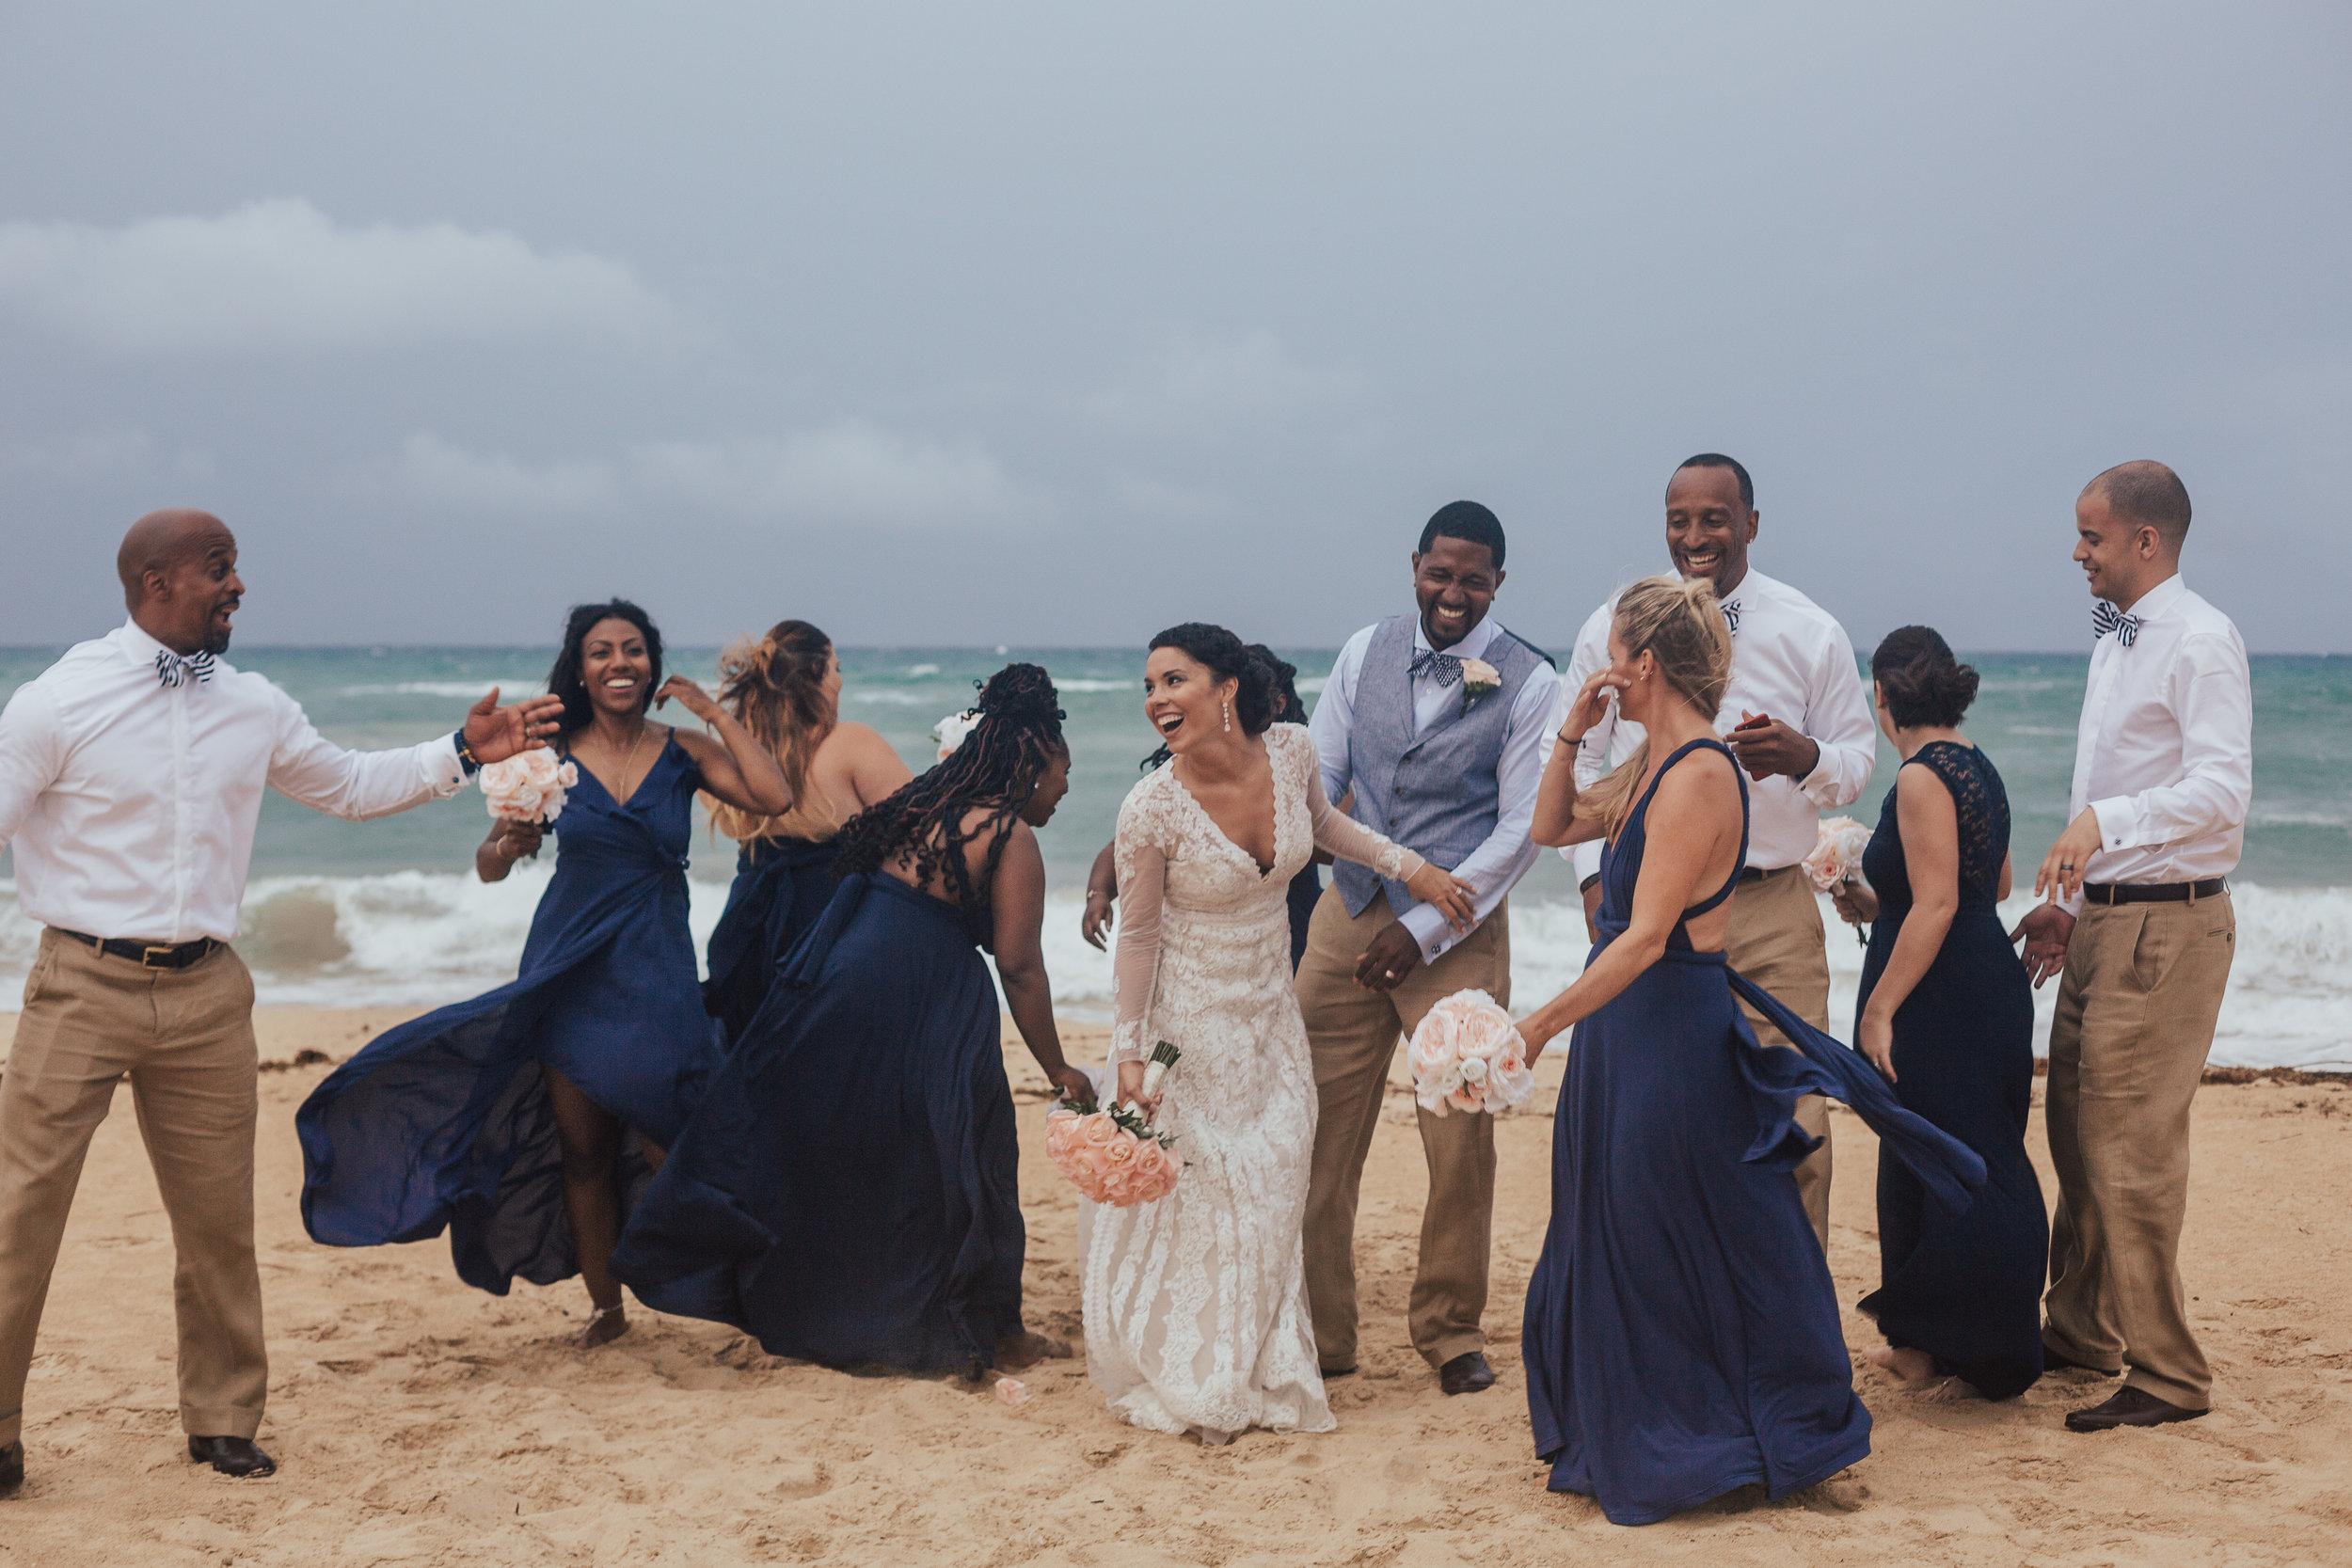 Destination-Wedding-Photographer-cleveland-wedding-photographer-elopement-photographer-beach-wedding-tulum-wedding